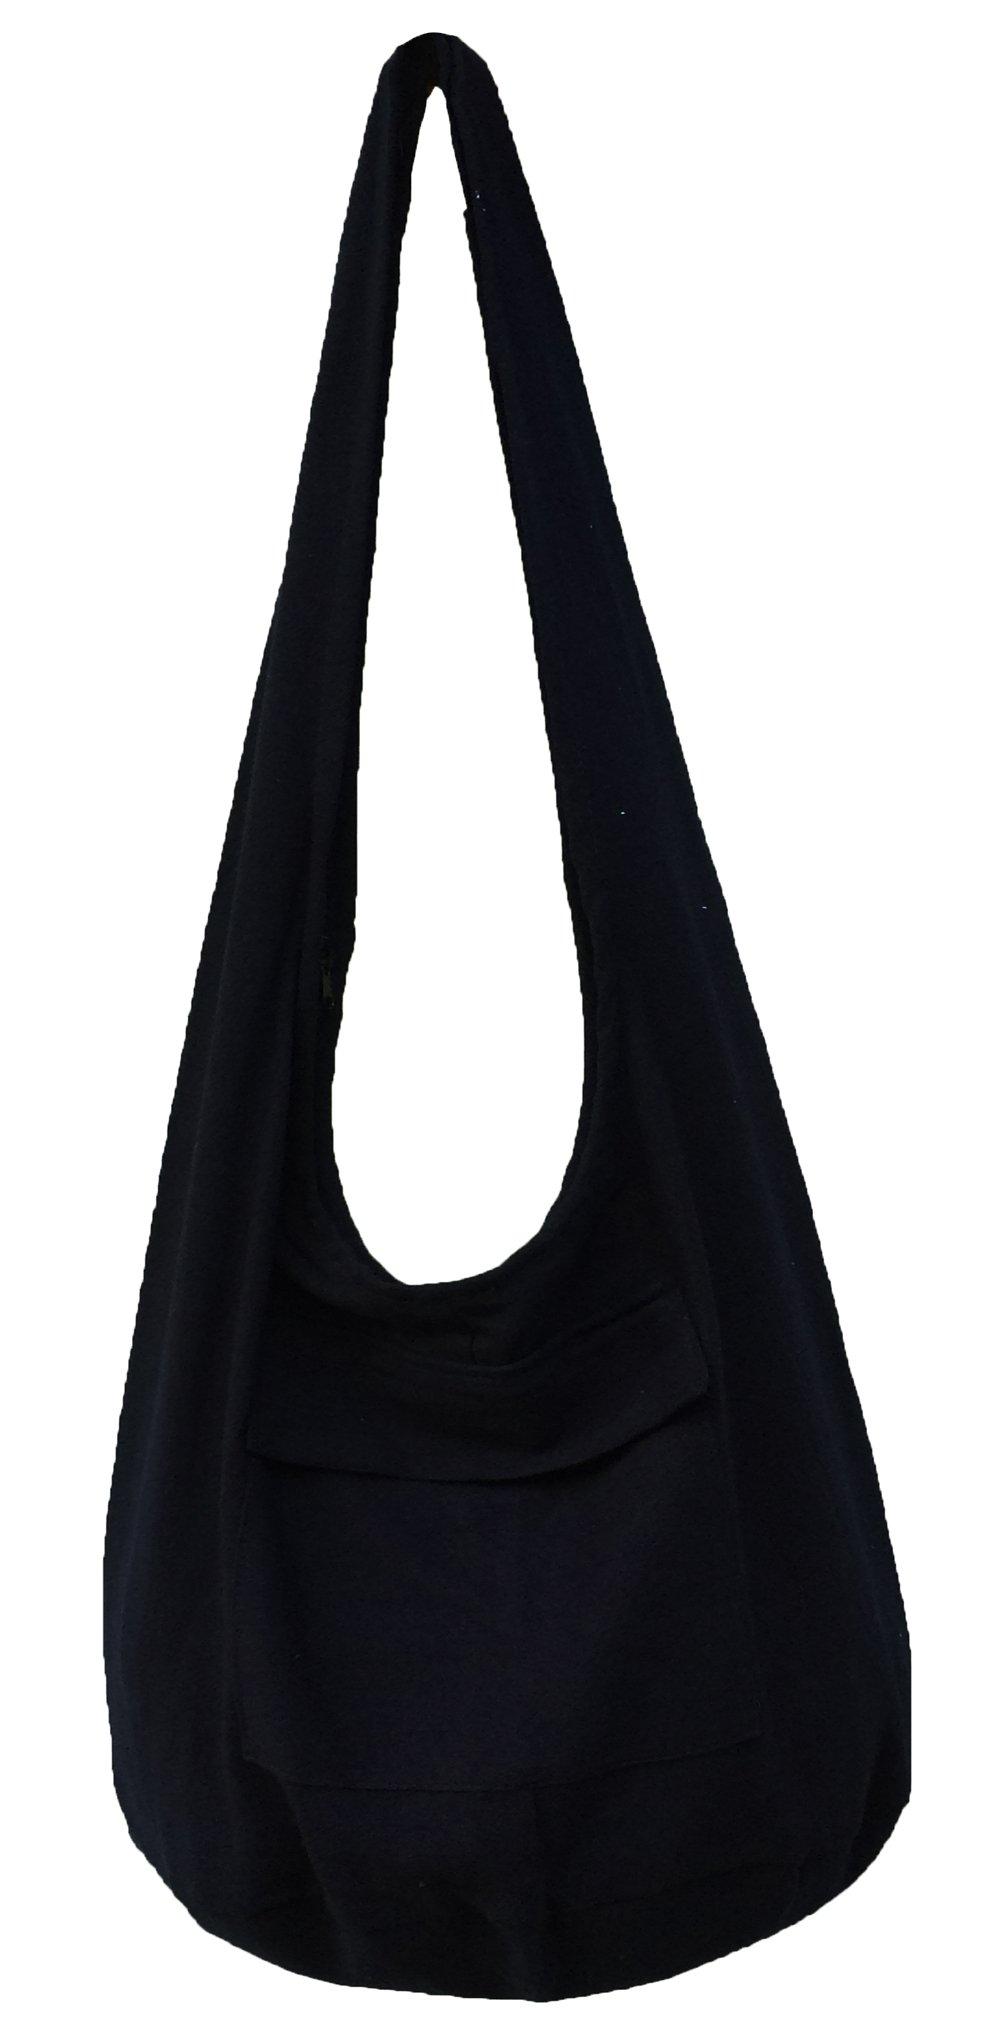 Thai Bag Tribal Bag Hmong Bag Boho Bag Striped Bag Ethnic Striped Thai Cotton Boho Sling Tribal Crossbody Bag Shoulder Bag Thai Pattern Bag Thai Top Zip Handmade Asia Bag (Black)